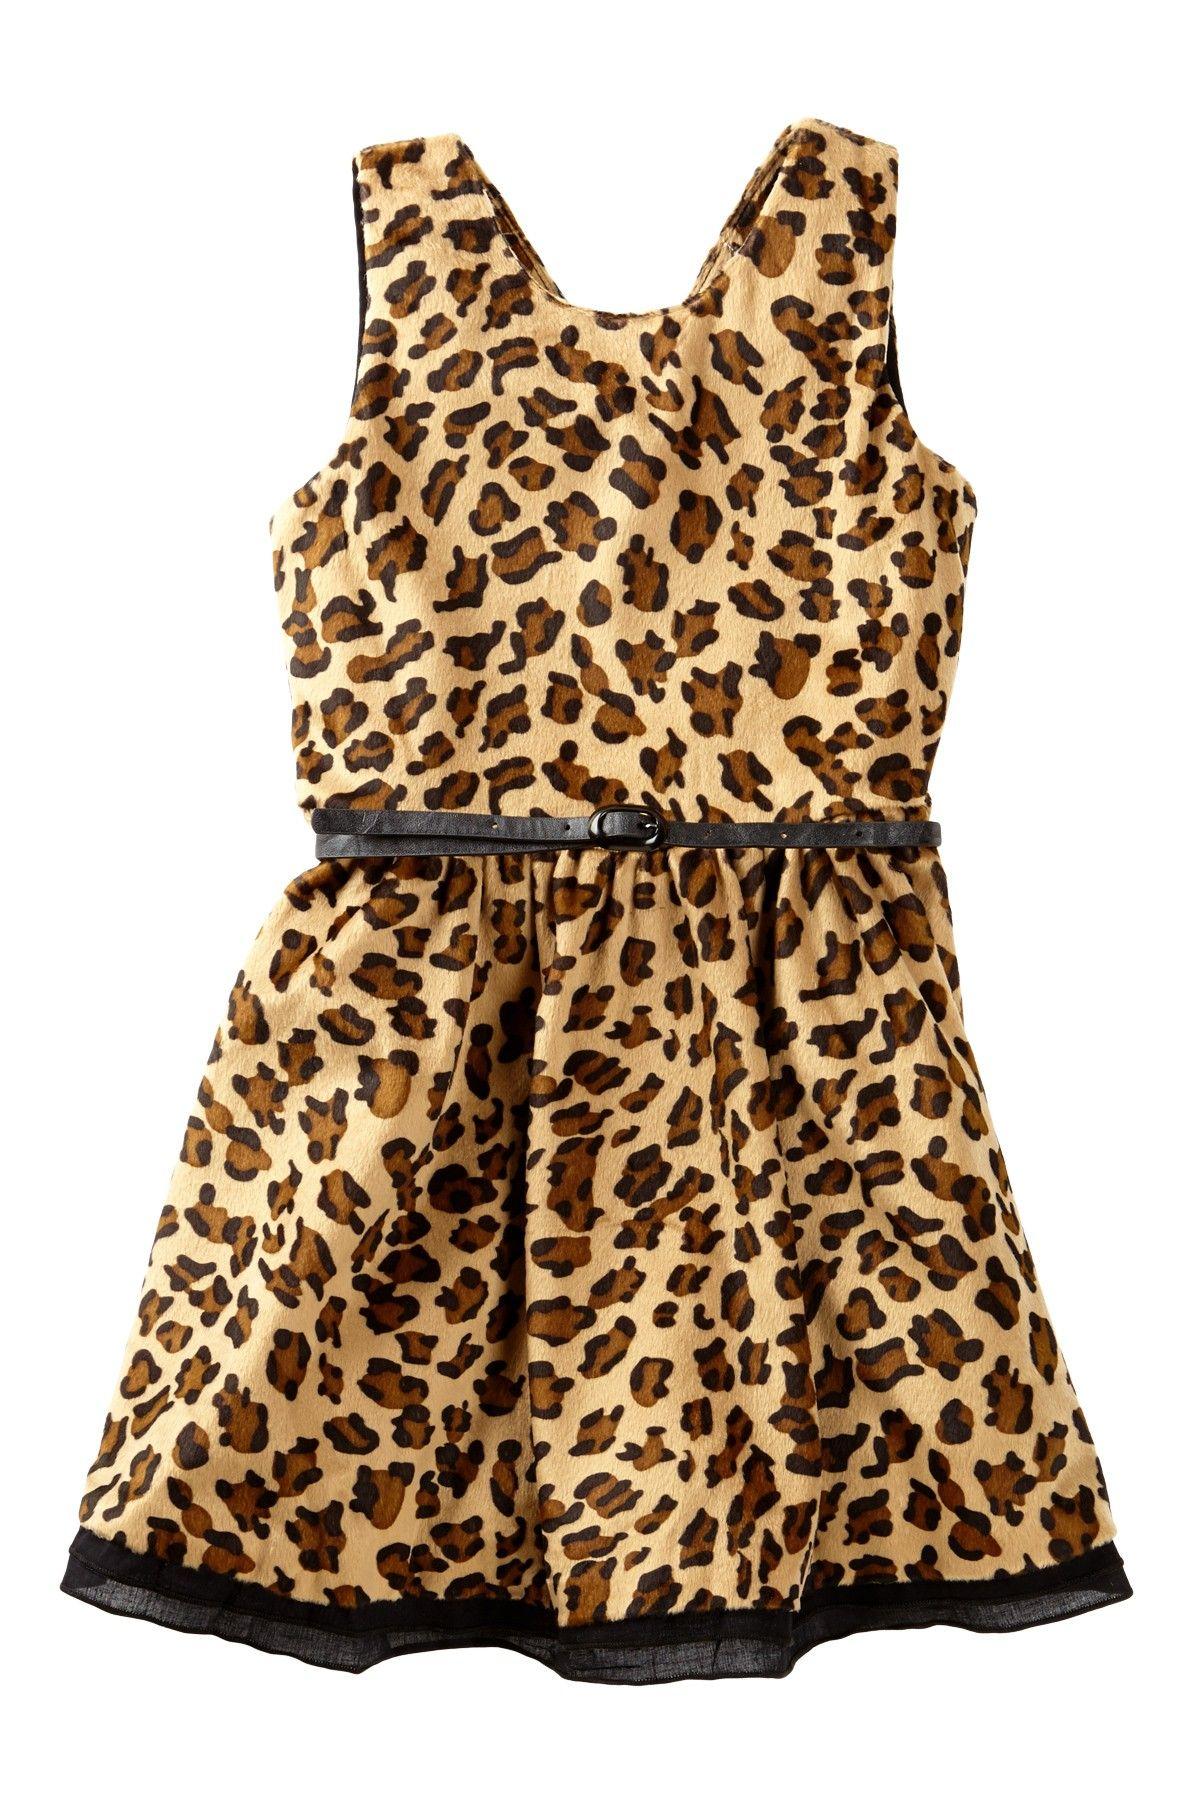 Leopard Print Dress (Toddler   Little Girls) by Paulinie on  HauteLook 8de72a67d